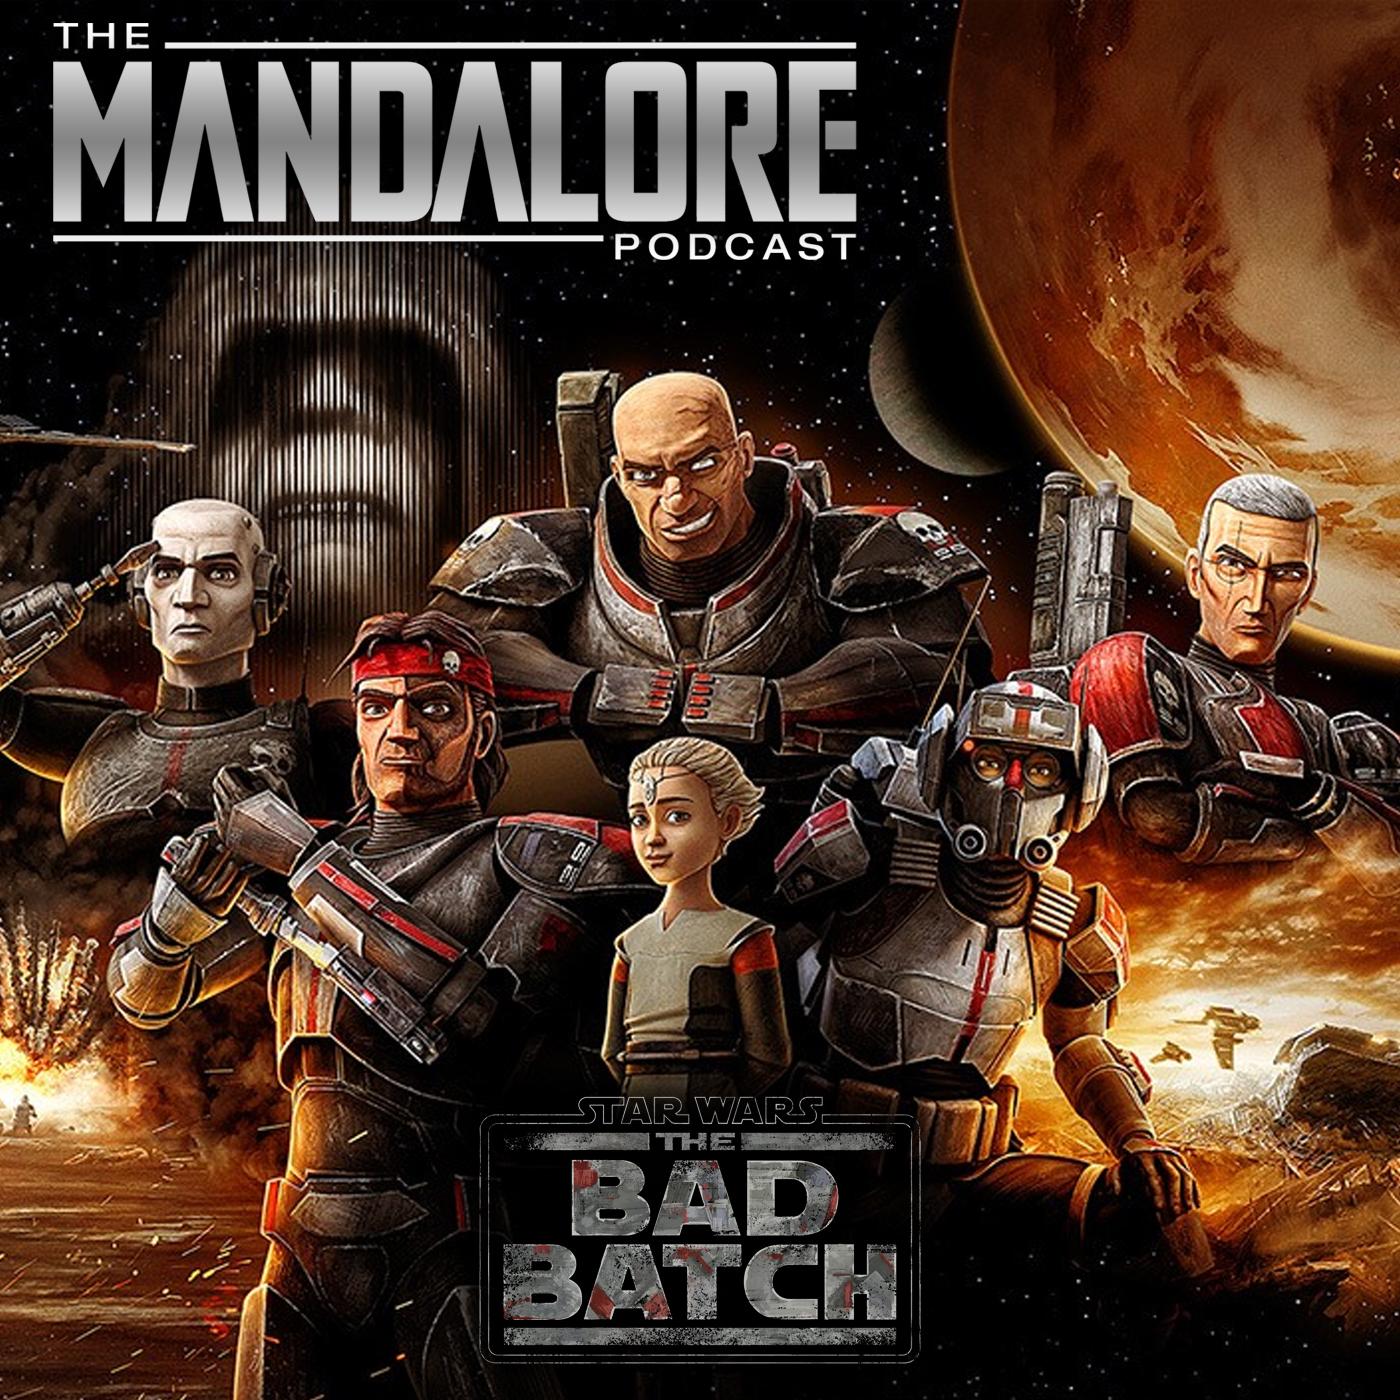 The Bad Batch - S1E14 - War-Mantle